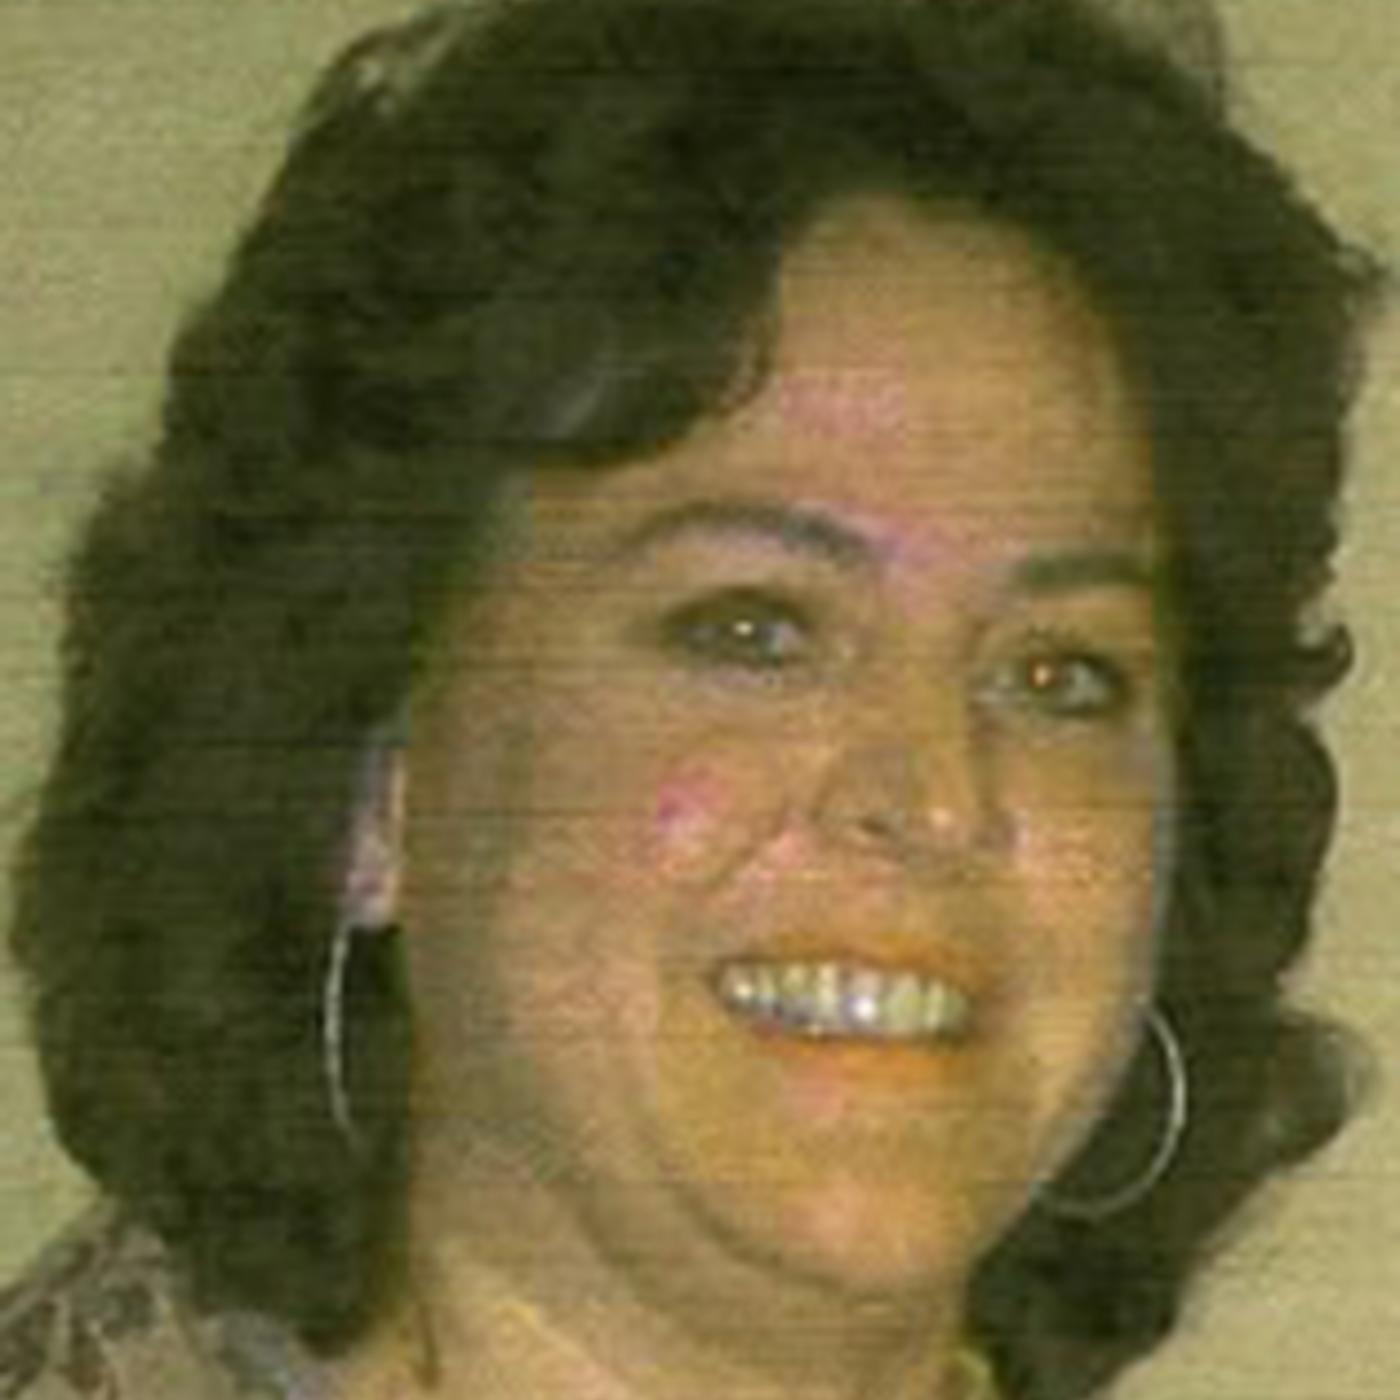 73: Rhonda Smith